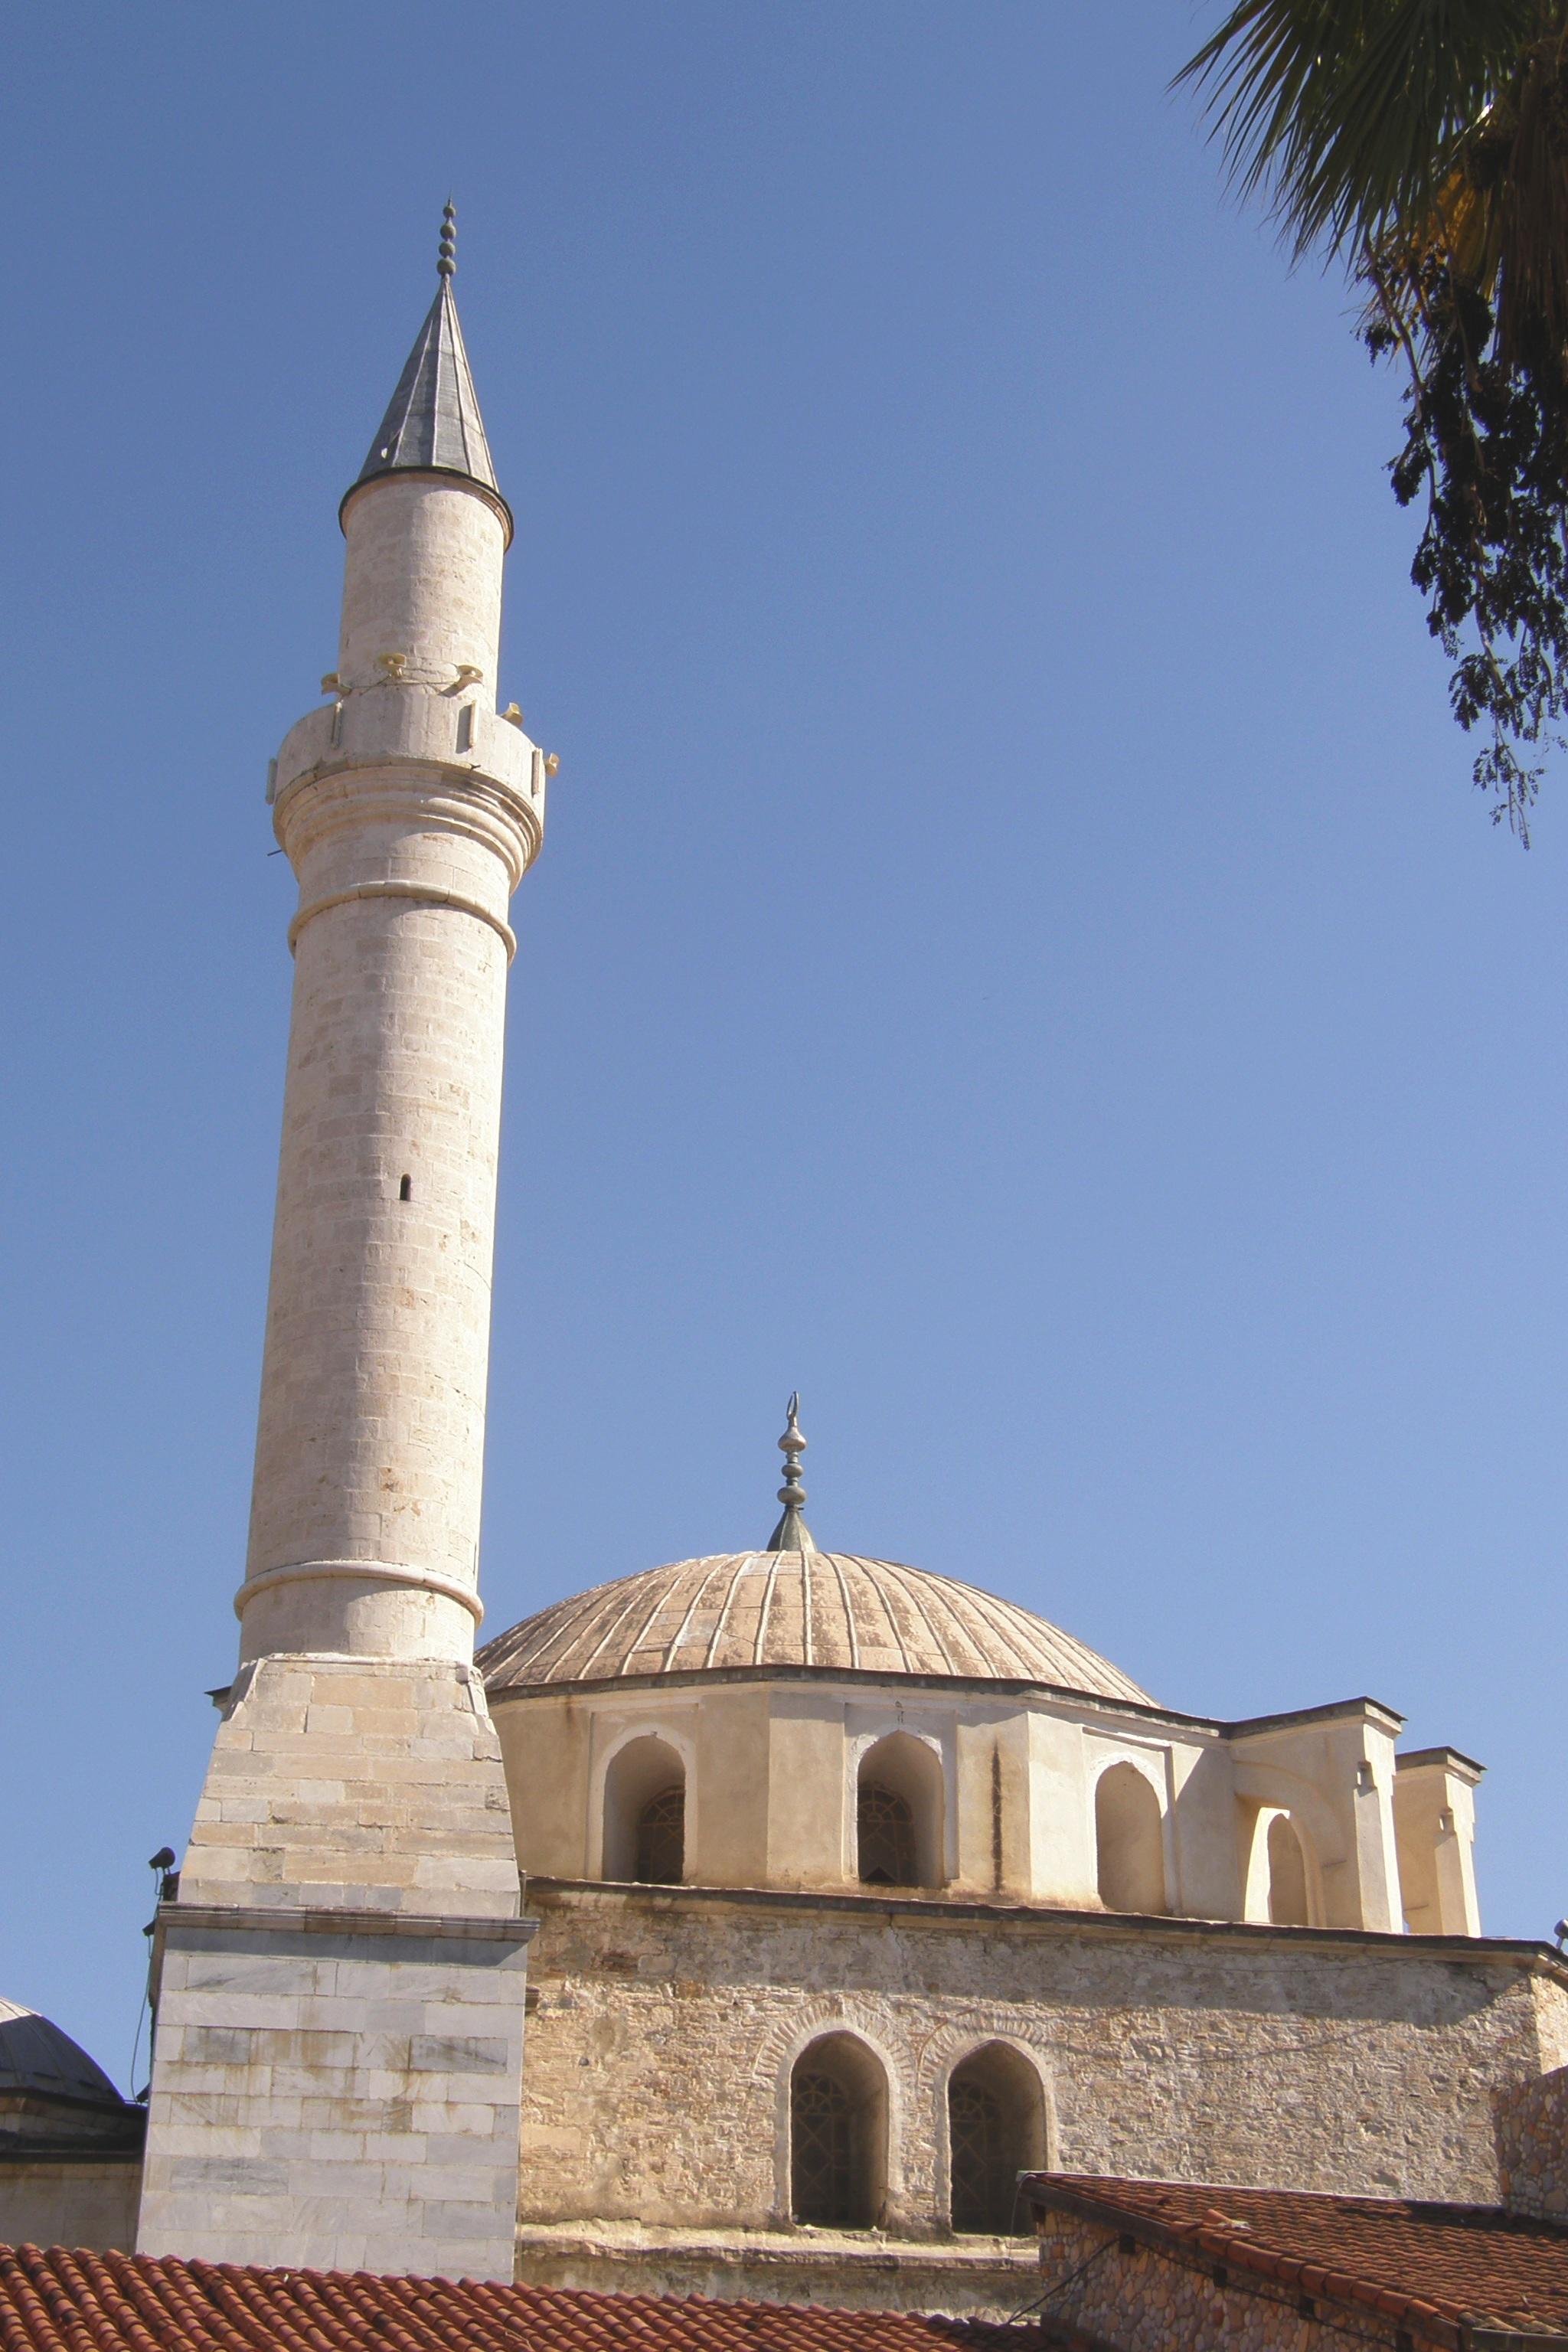 File:Mosquée Kaleiçi, Kuşadası (Turquie).JPG - Wikipedia